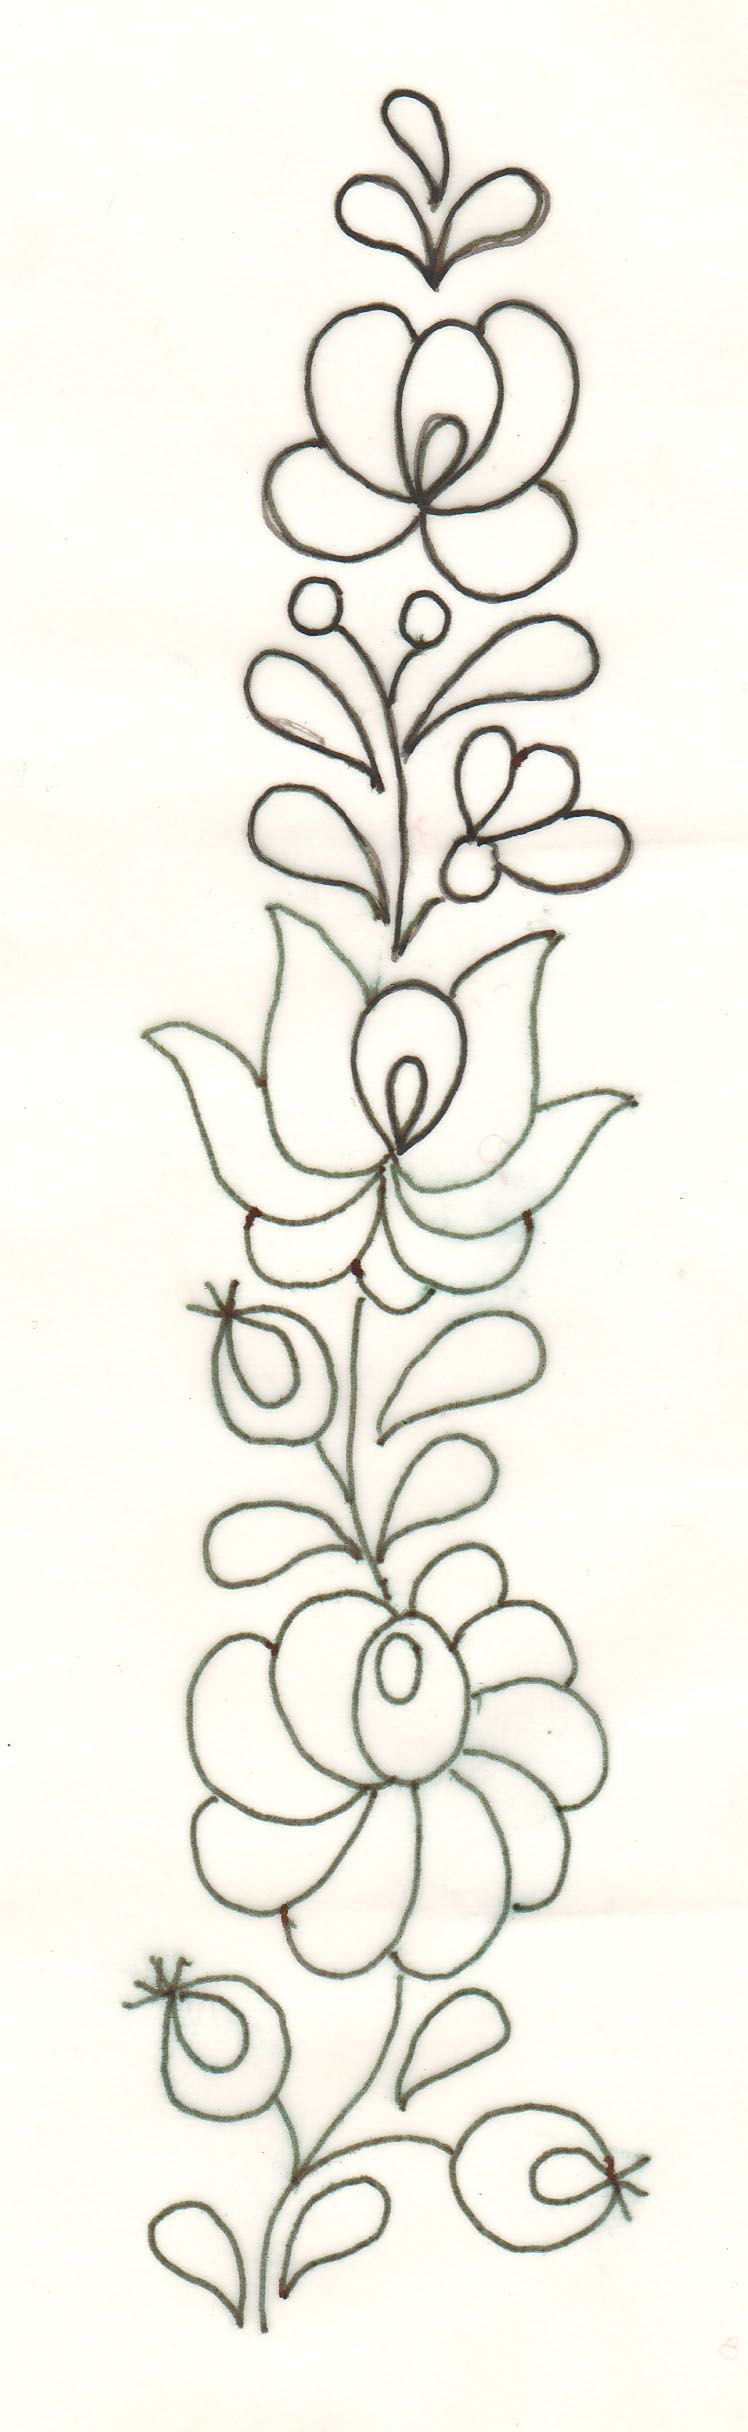 Sencillo bordado en tela pinterest embroidery patterns and sencillo bankloansurffo Images